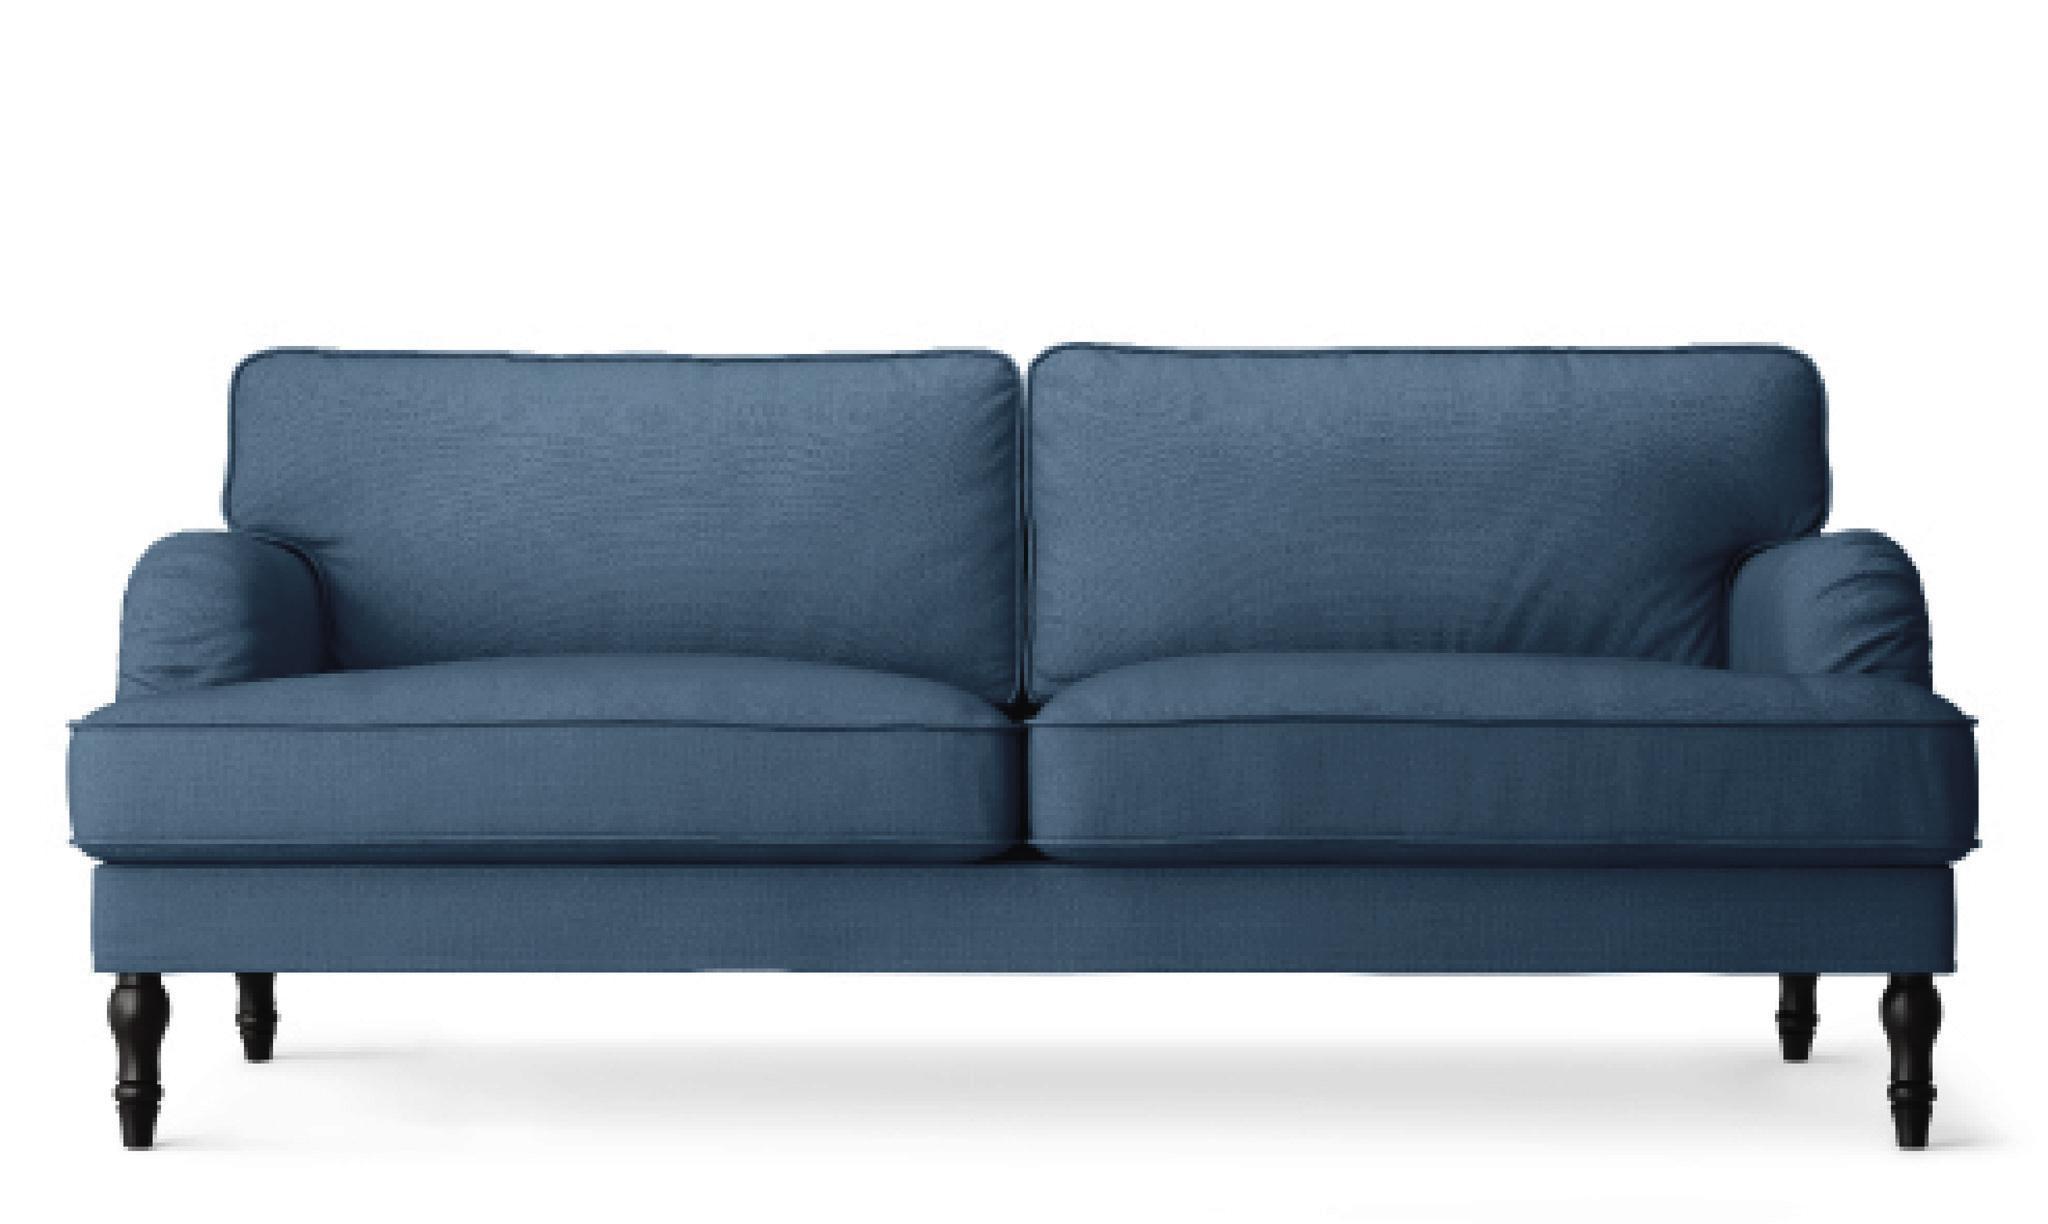 Fabric Sofas | Ikea Ireland – Dublin Within Fabric Sofas (View 10 of 20)